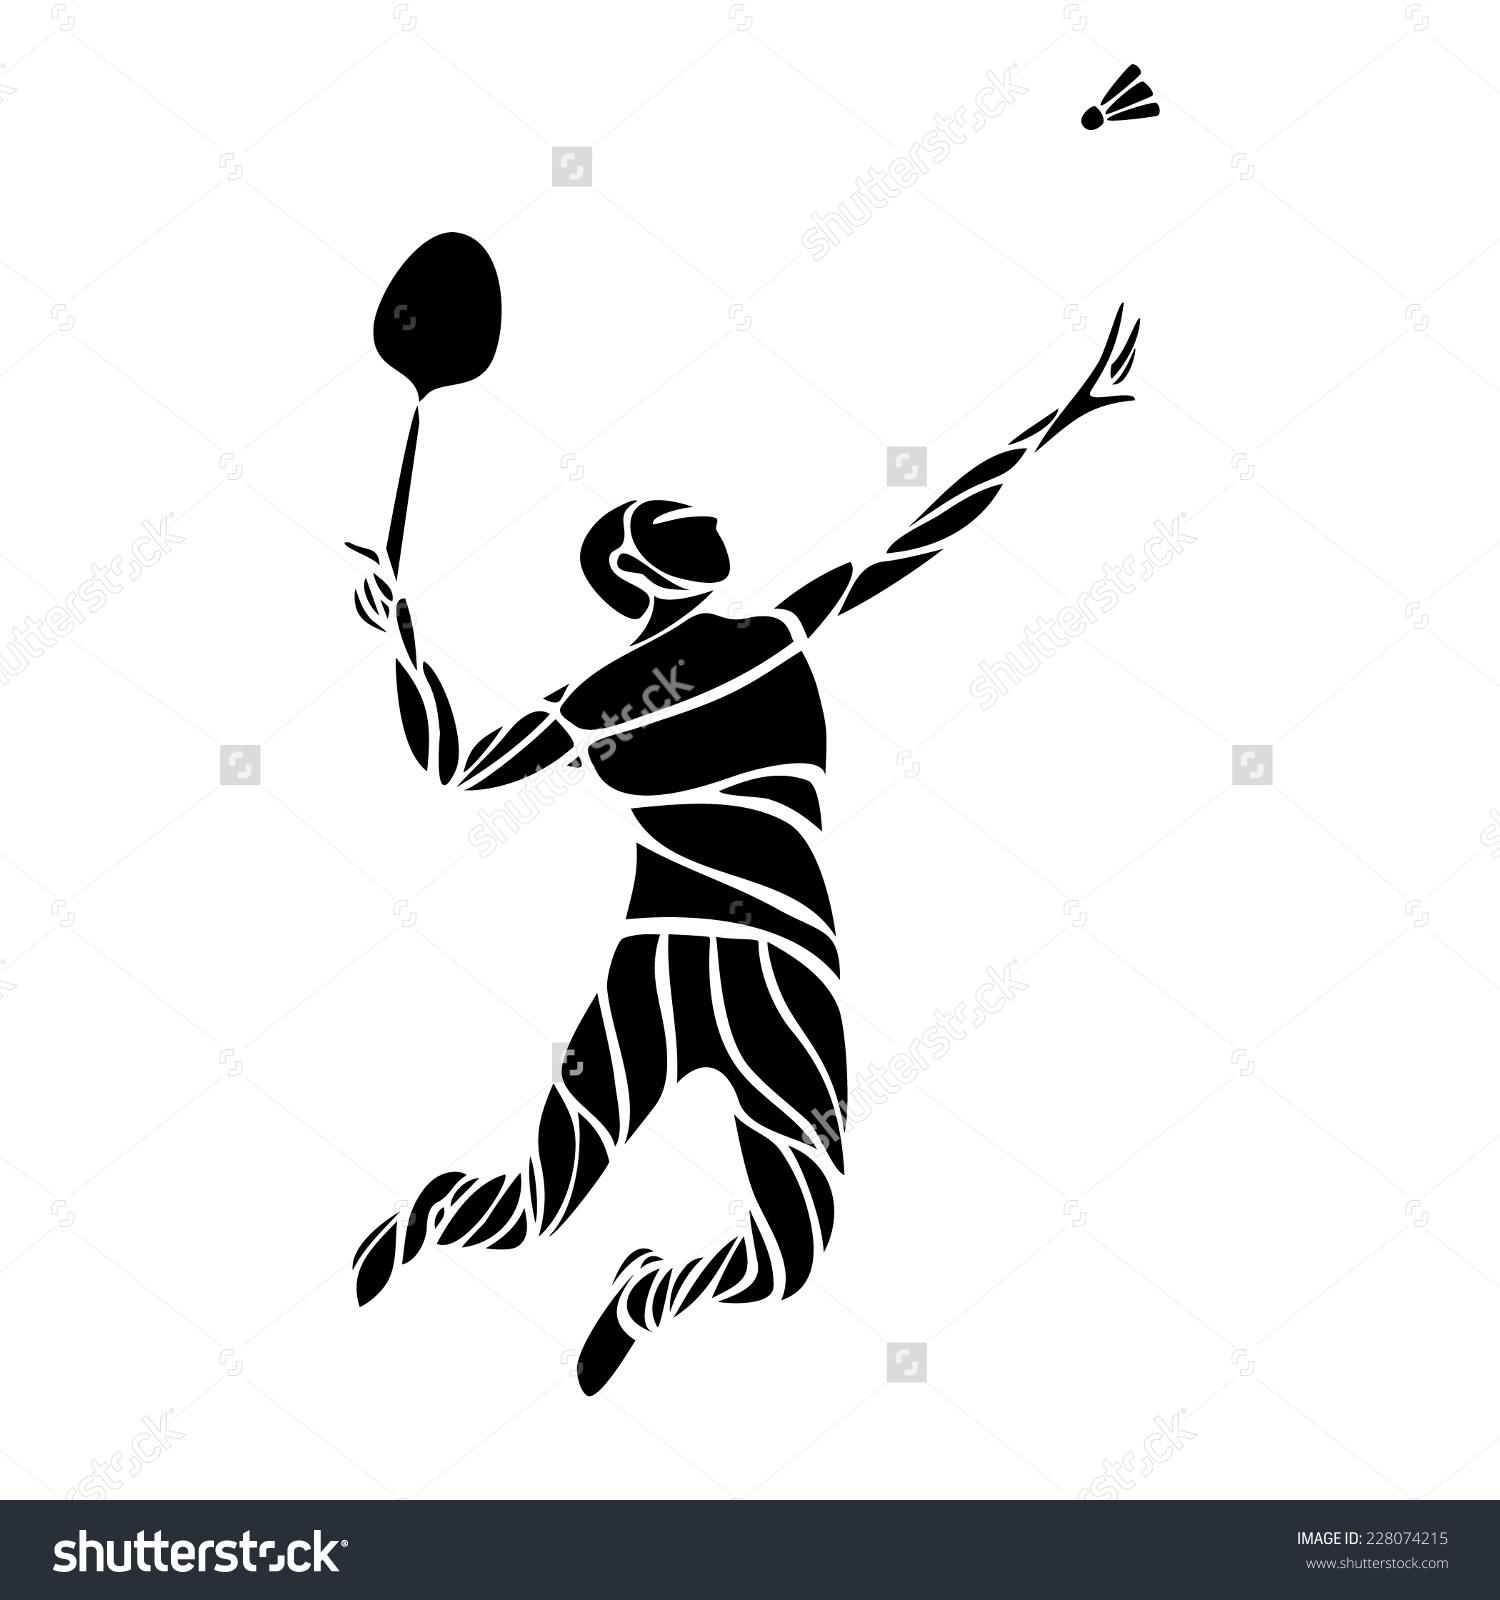 Badminton Smash Clipart Com Smash Clipart Badminton Badminton